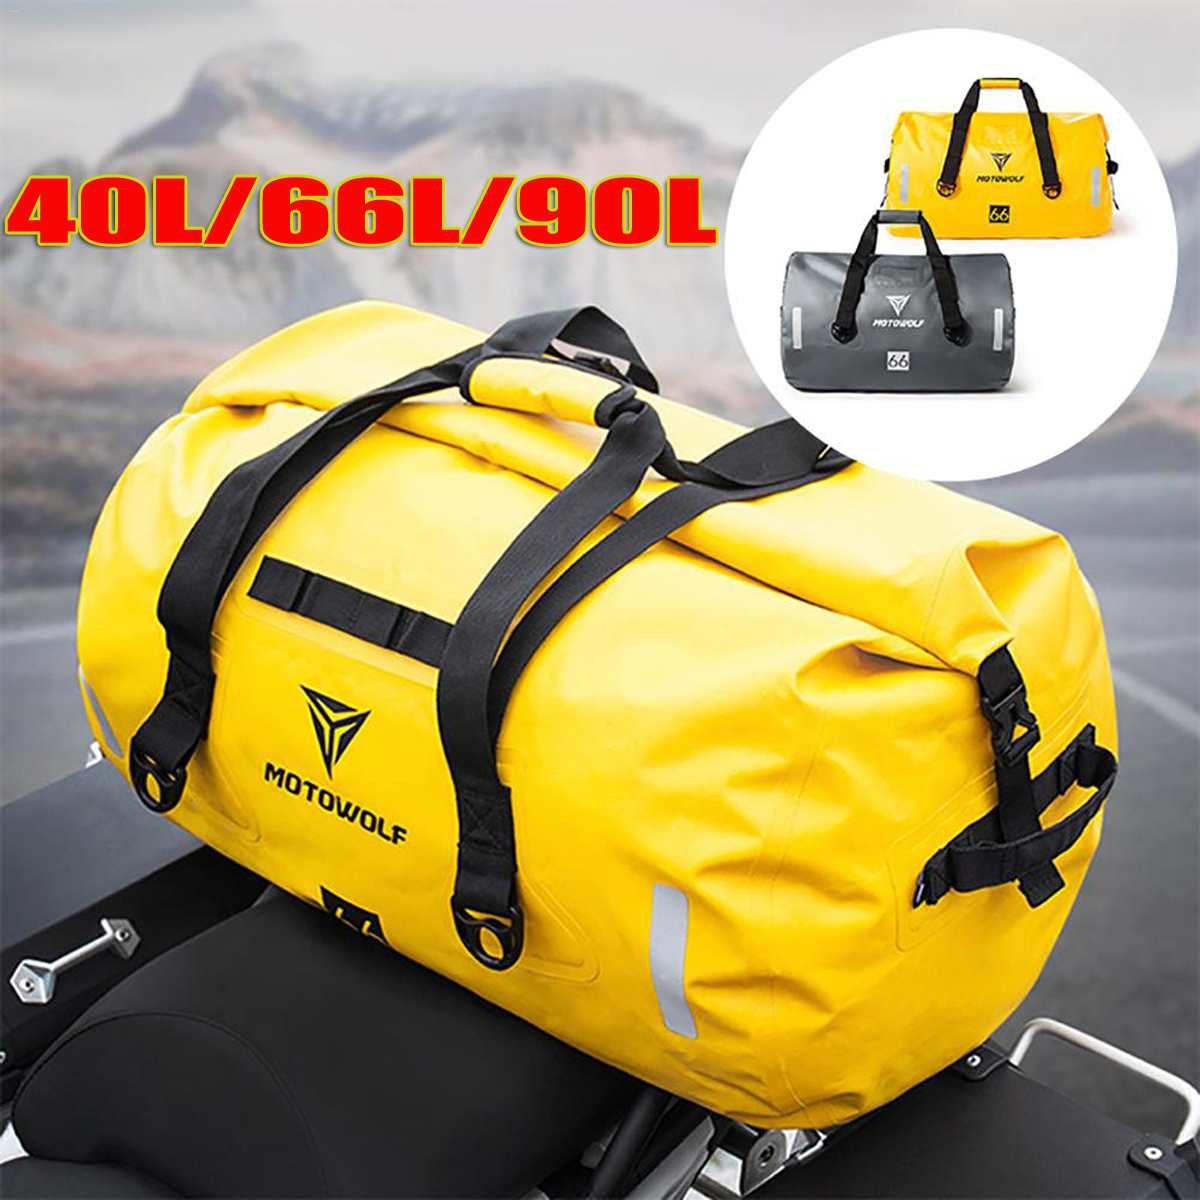 90L/66L/40L Motorcycle Saddle bags Waterproof Tail Bag Multi functional Motorcycle Seat Bag High Capacity Moto Rider Backpack